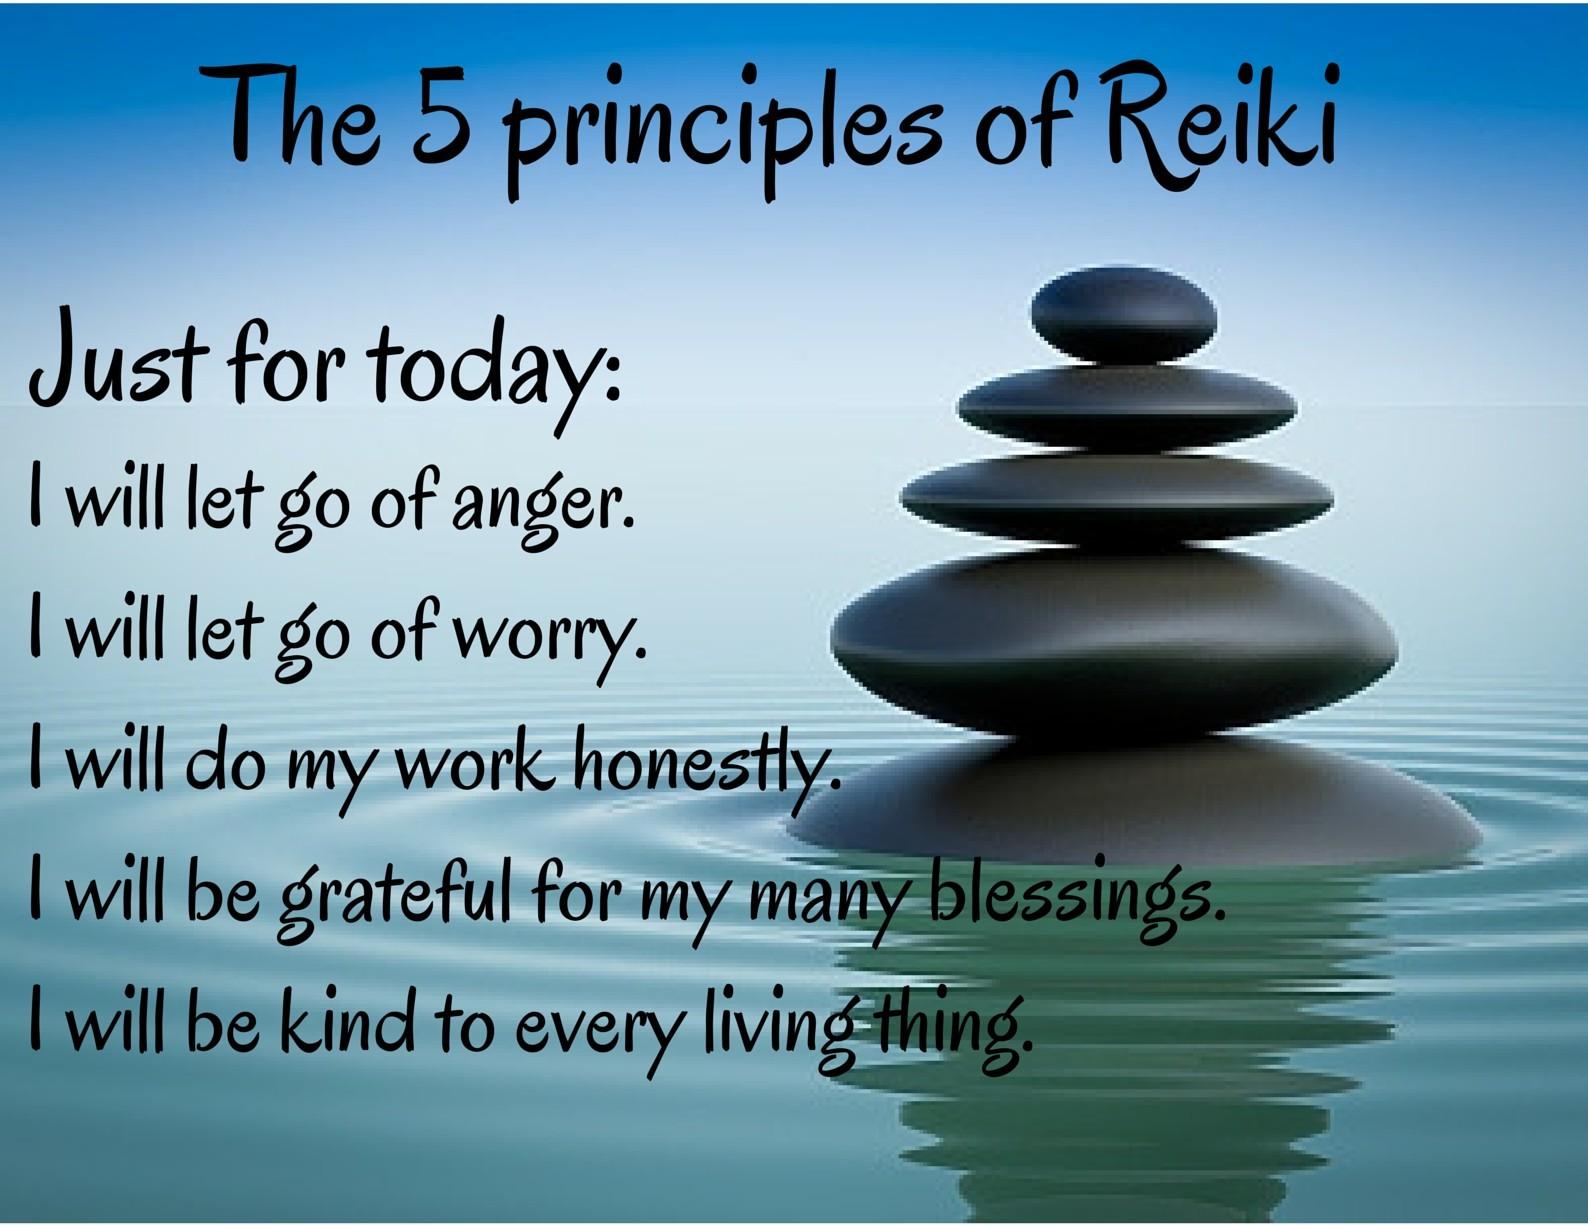 Magic Reiki  Elephants Family Blessings, Harmony,love  Necklace  energy inbound image 6